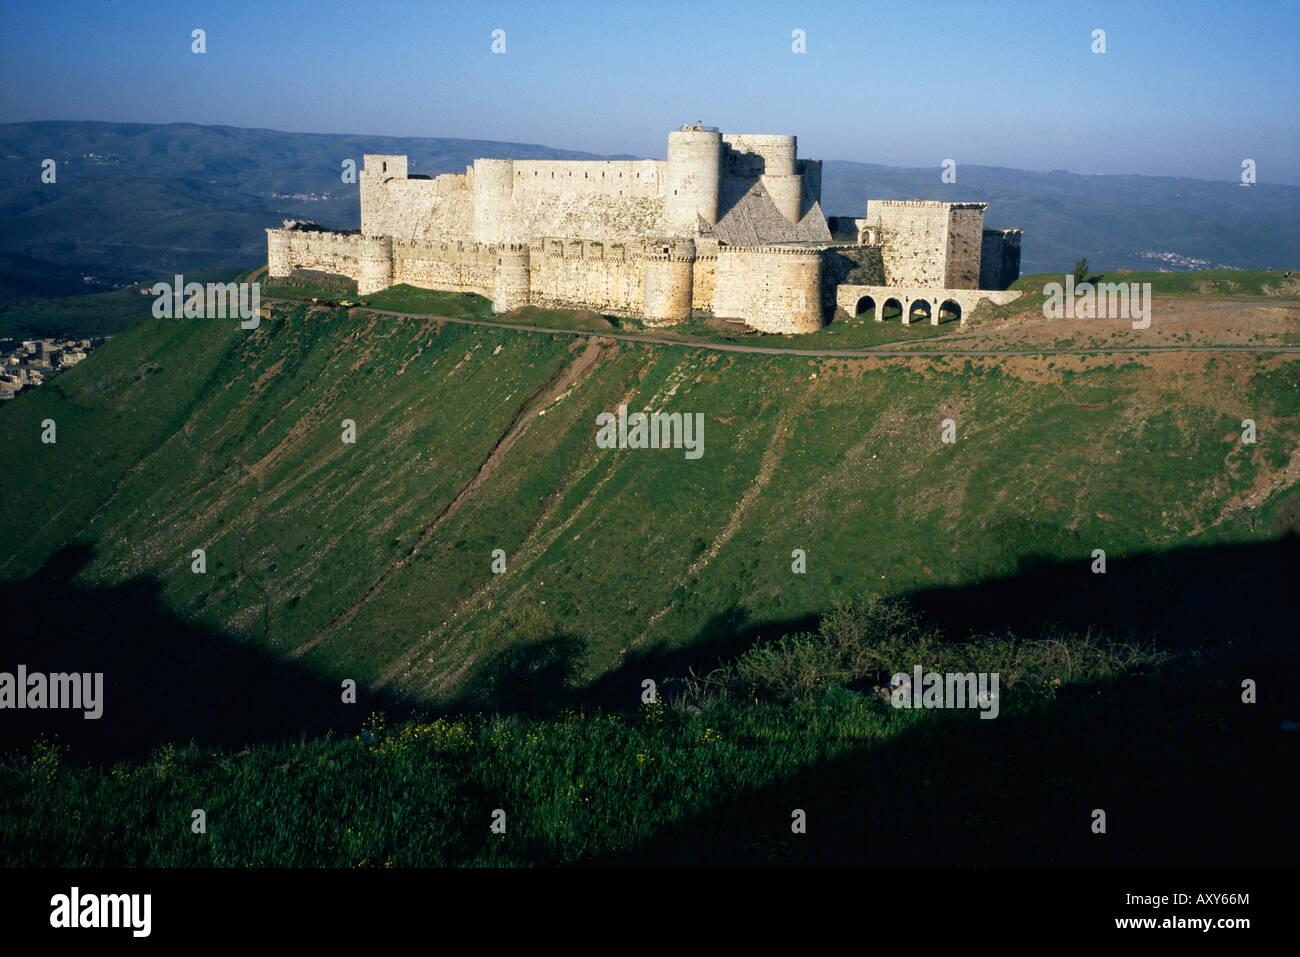 Crusader castle, Krak des Chevaliers, near Homs, Syria, Middle East - Stock Image